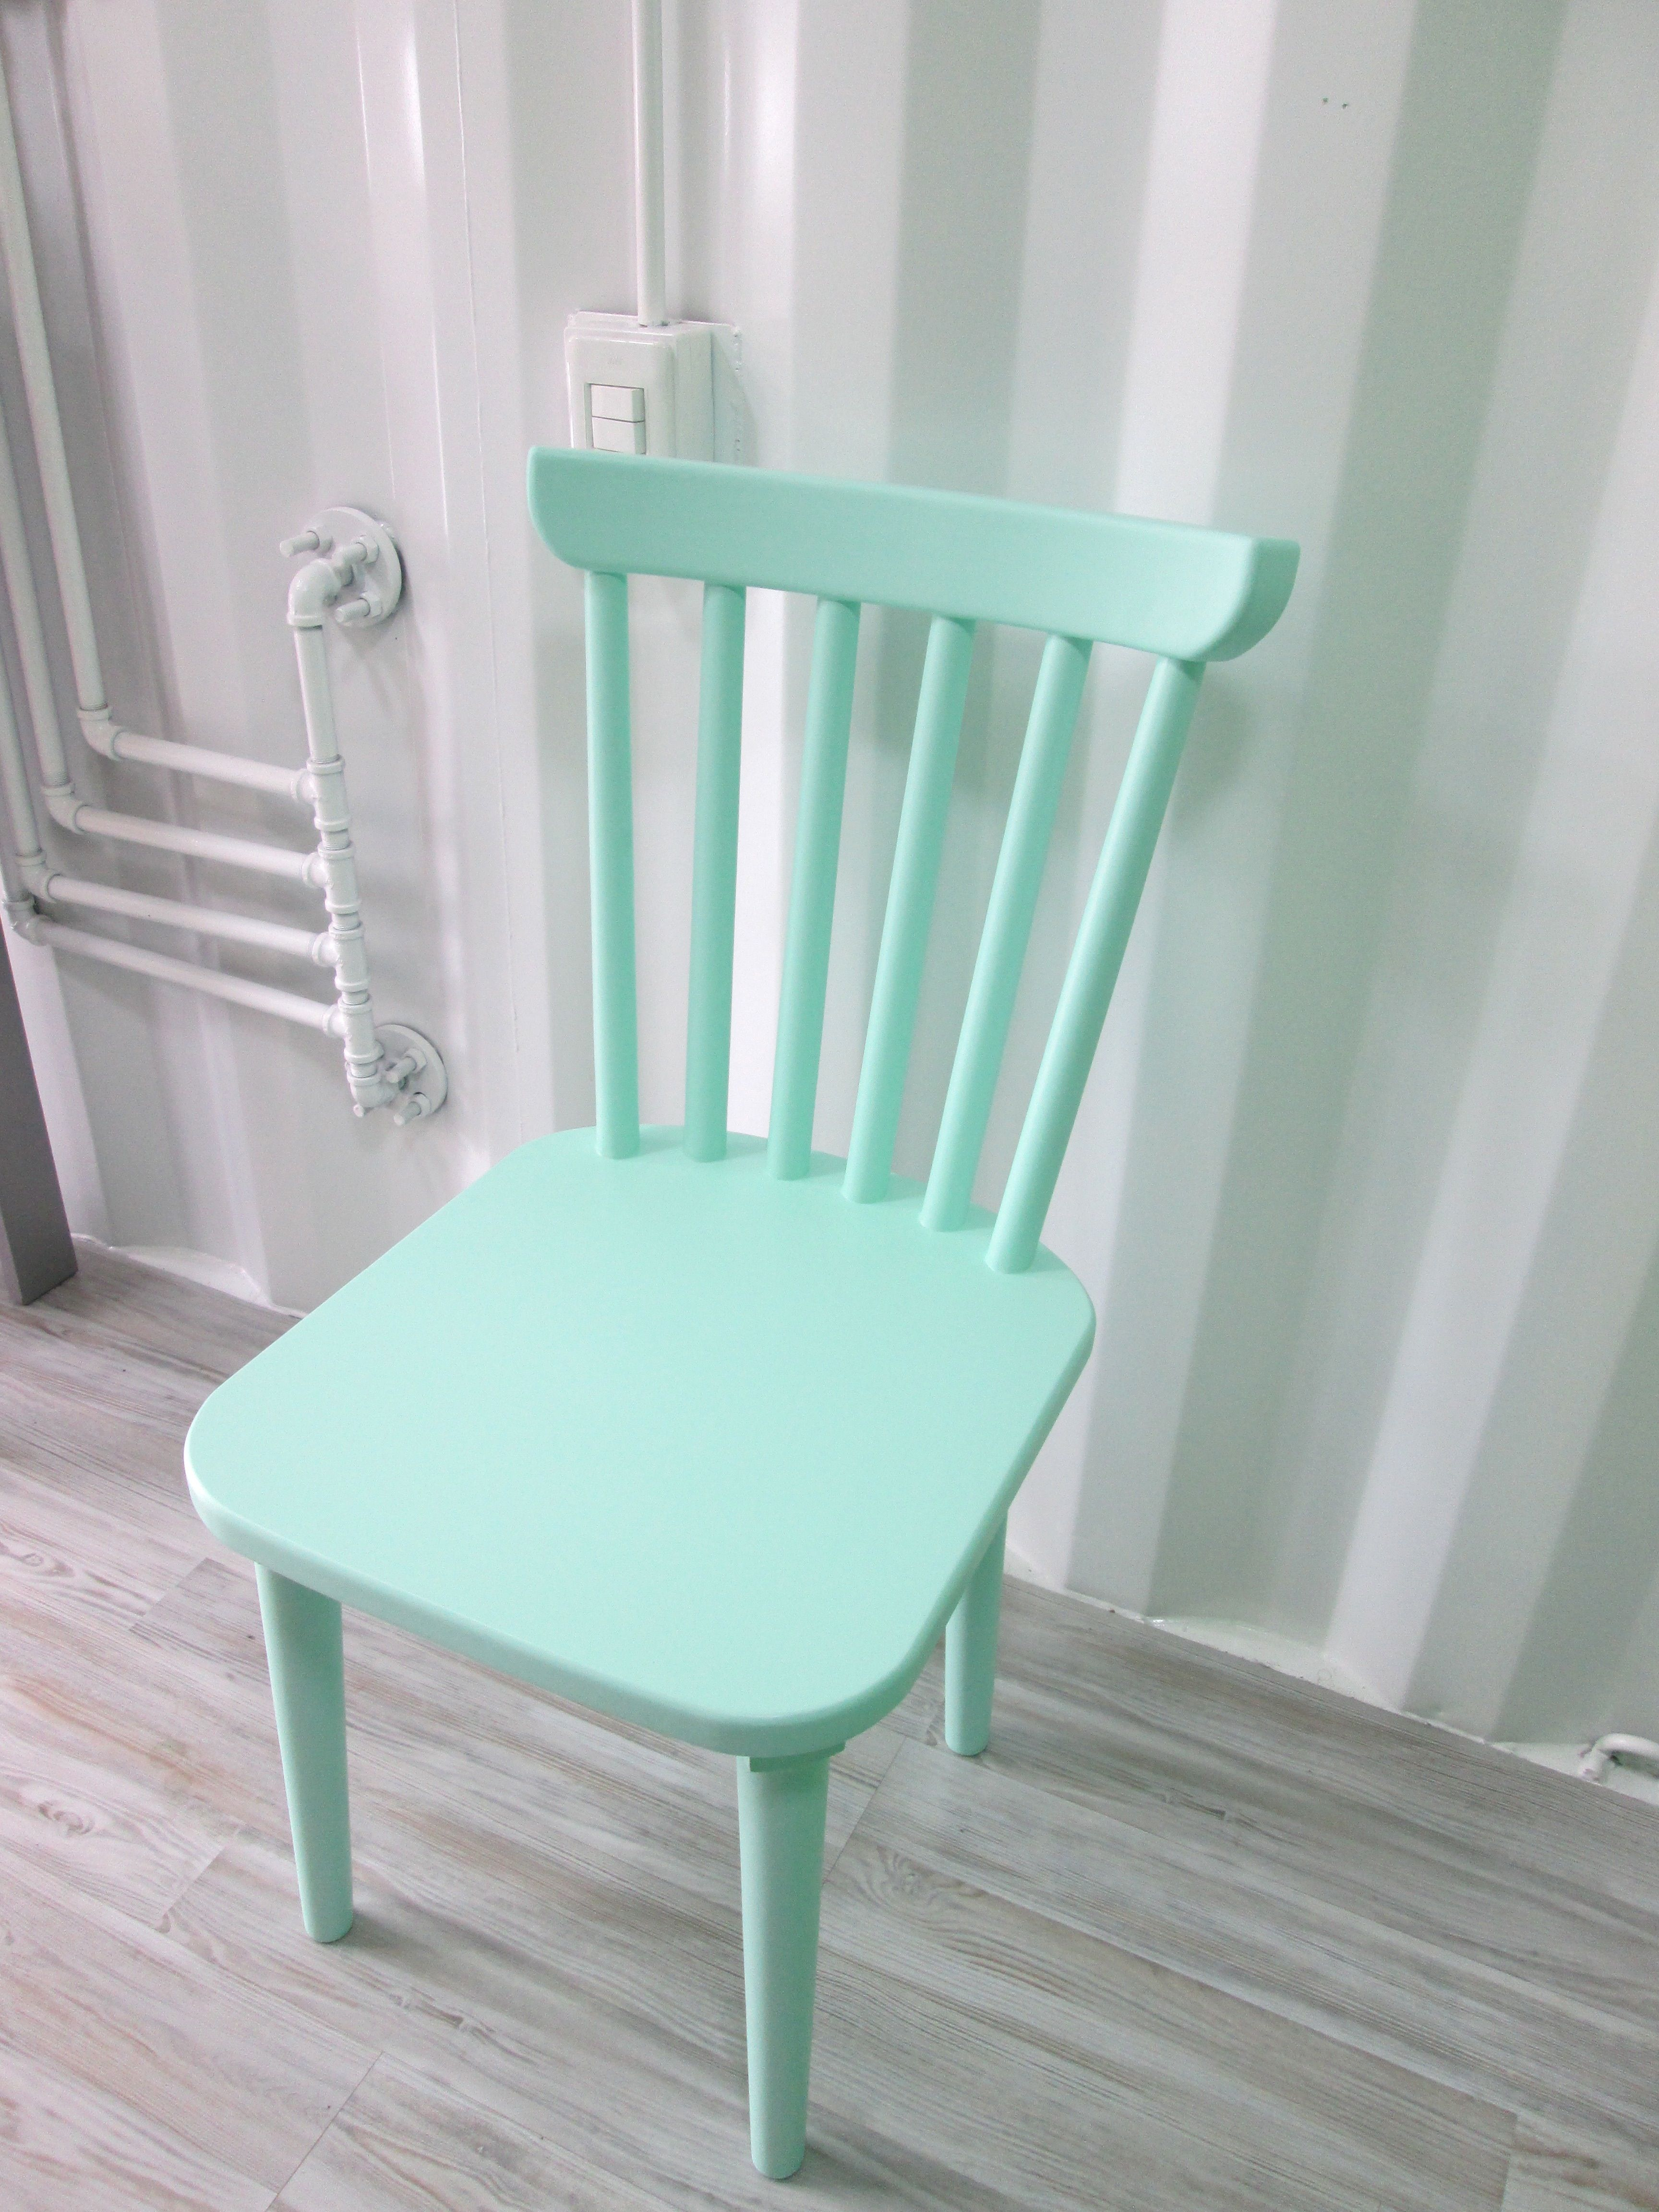 Silla candy hecha y pintada a mano y fabricada en madera perillo silla pinterest sillas - Pintar sillas de madera ...